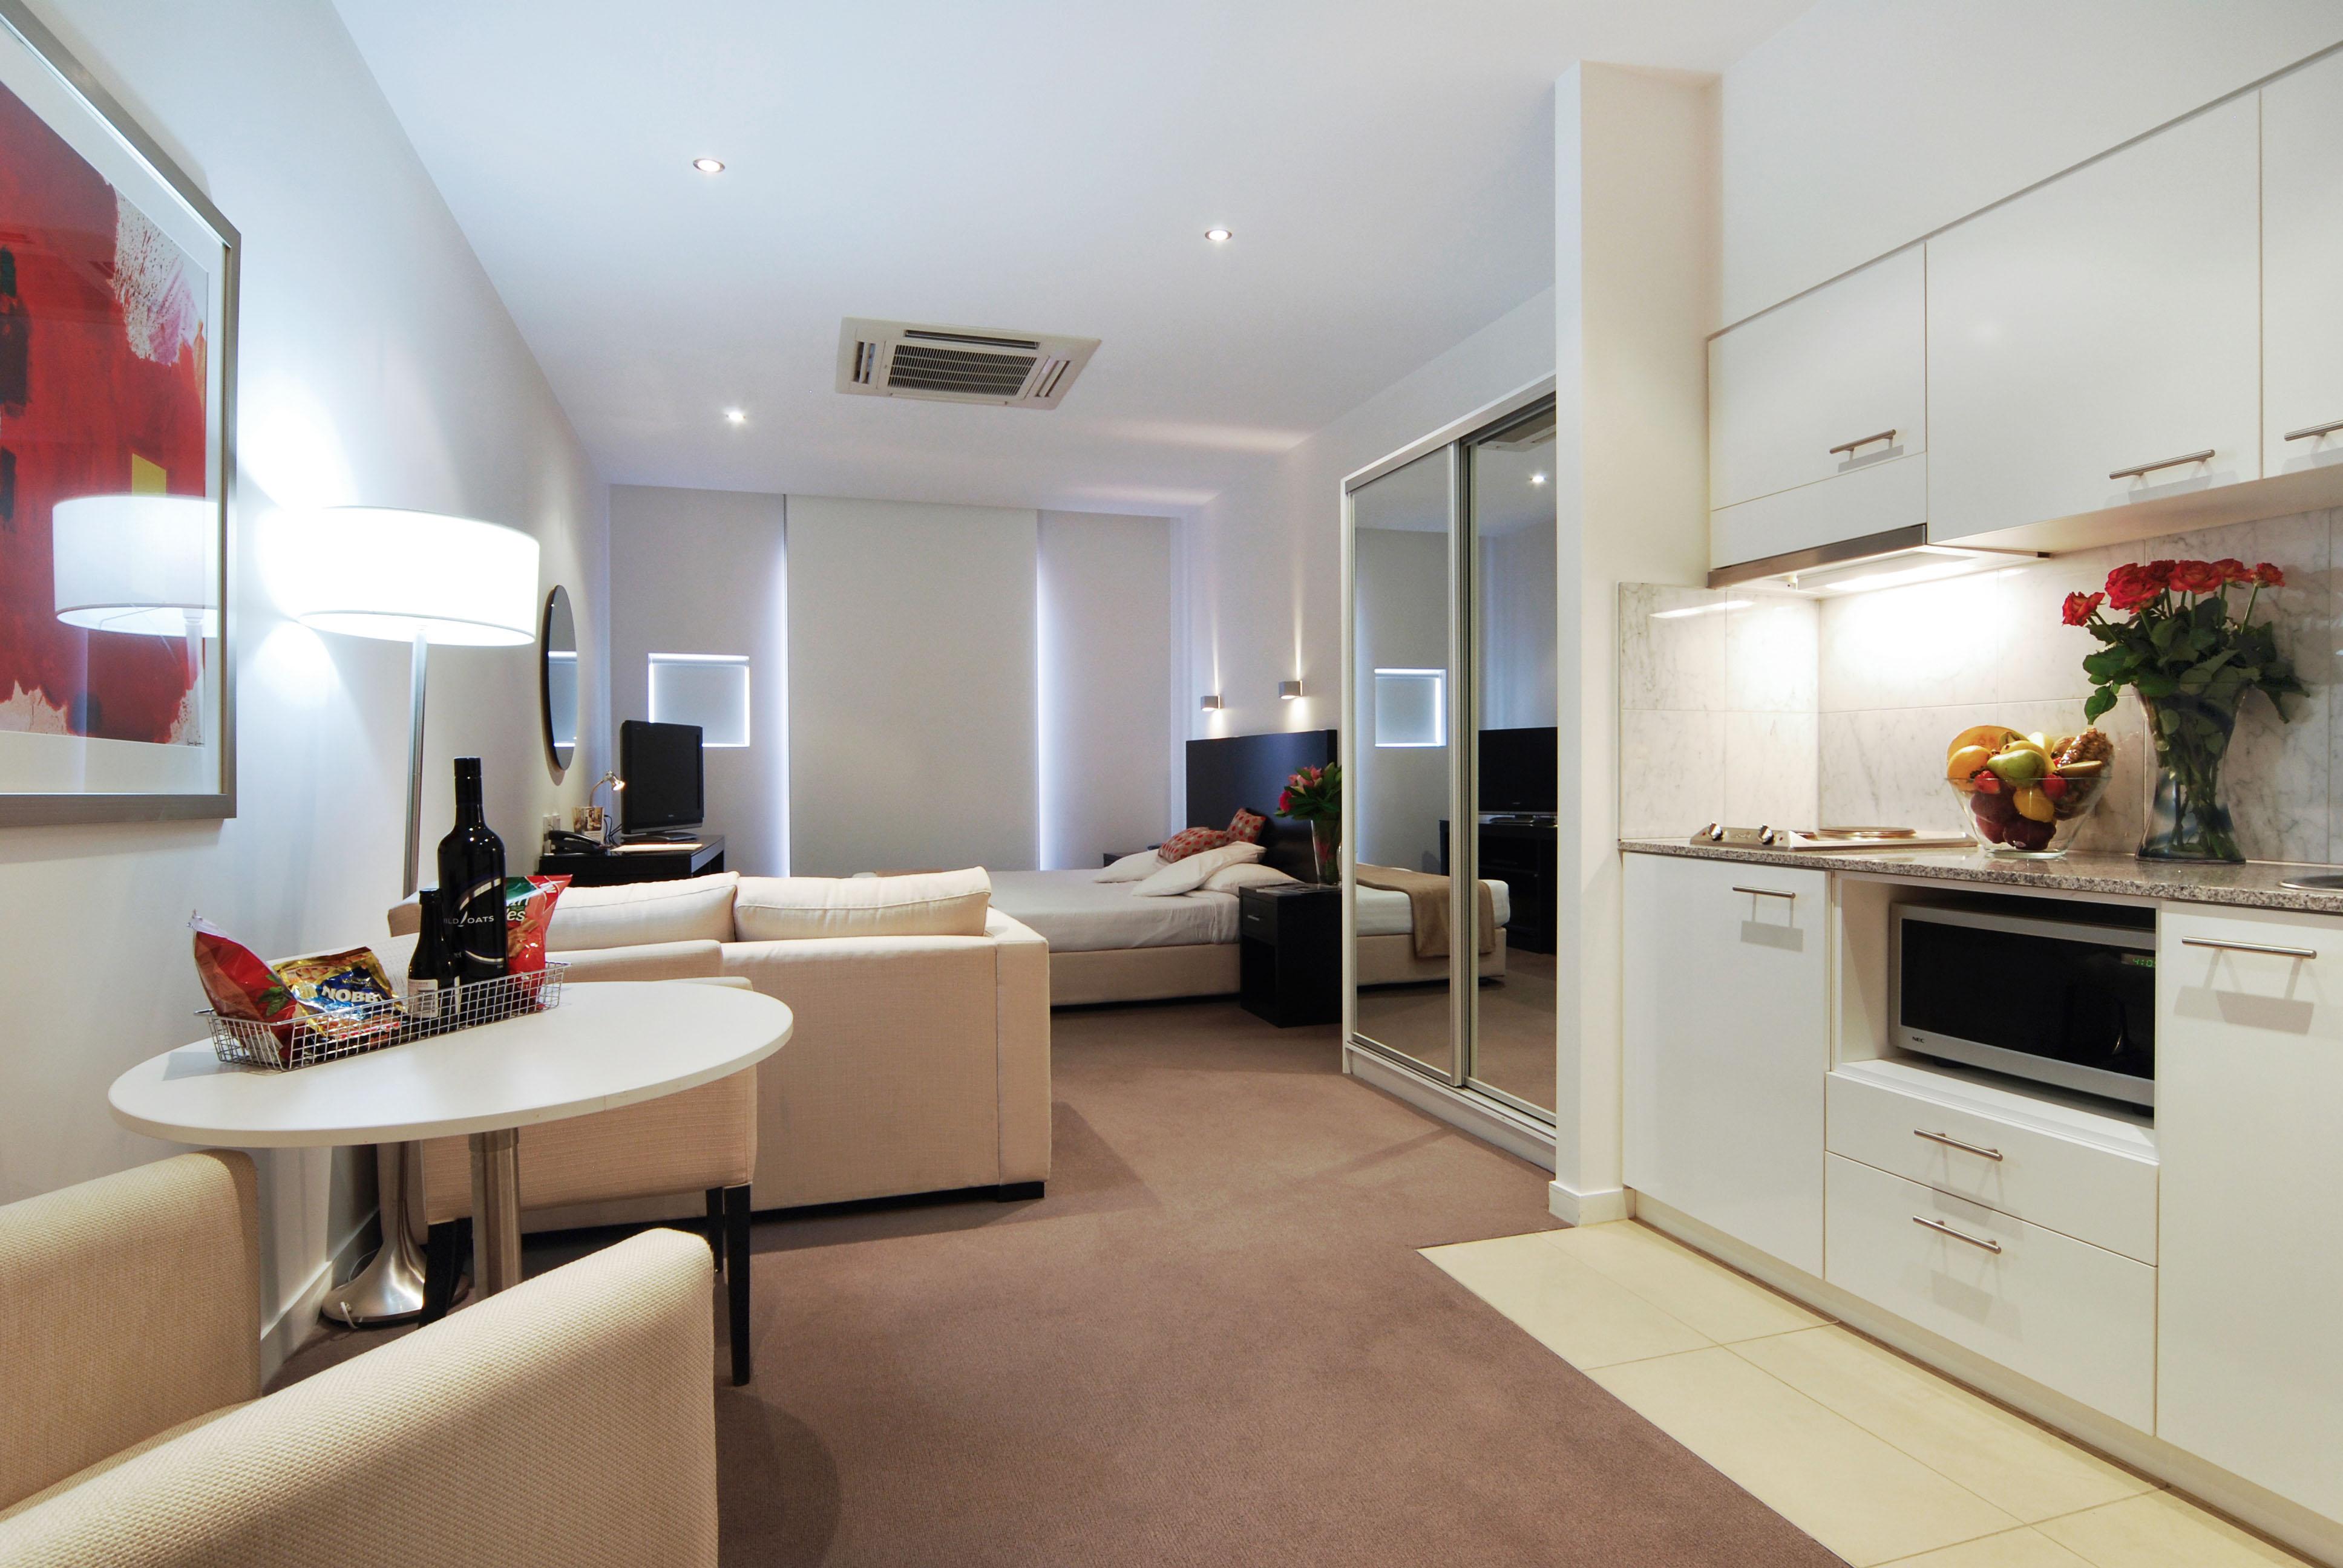 Материалы для отделки квартиры